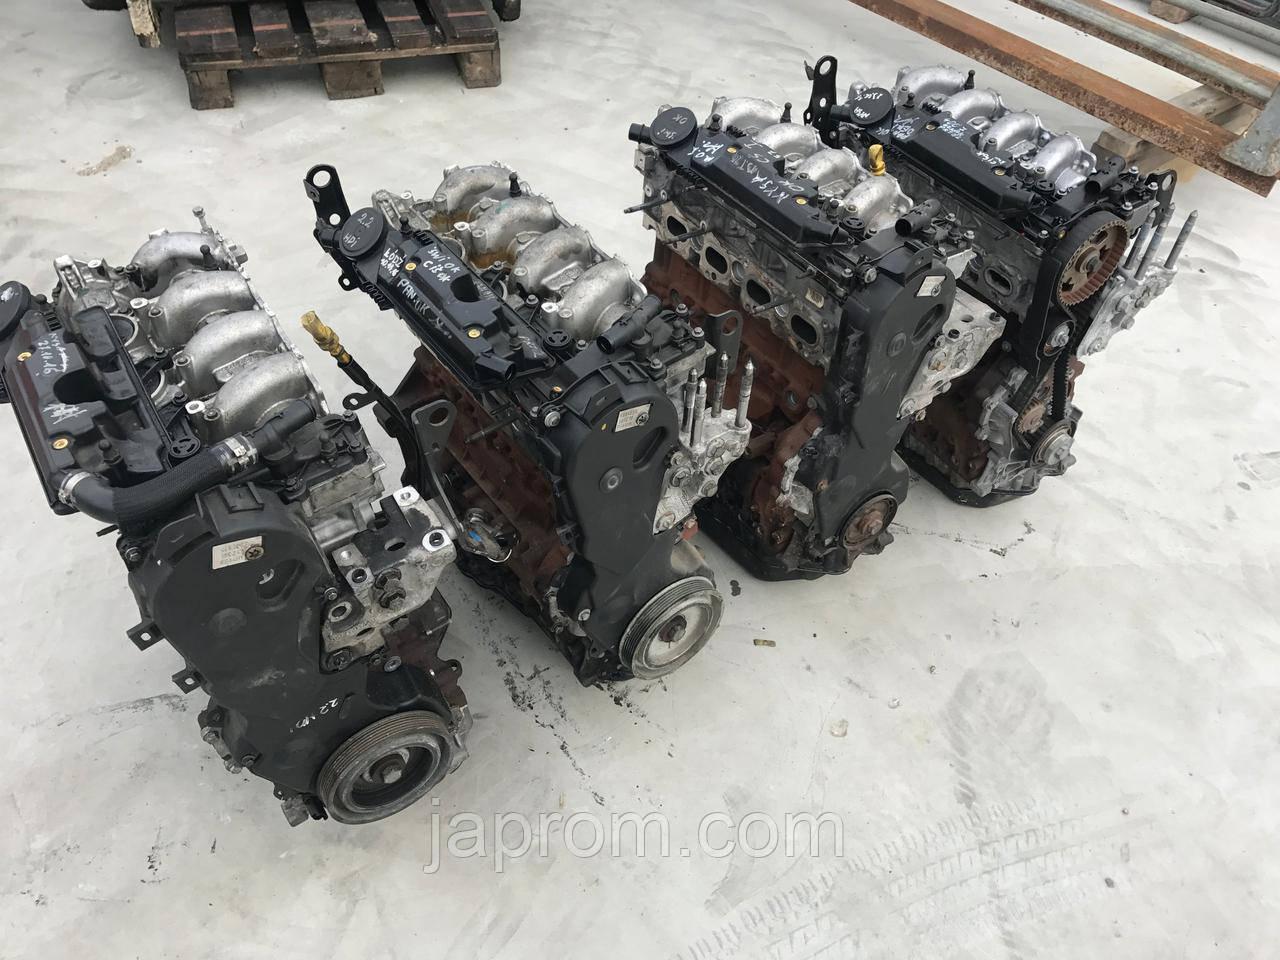 Мотор (Двигатель) Ford Mondeo S-max MK4 2008-2012 г.в. 2.2 TDCI